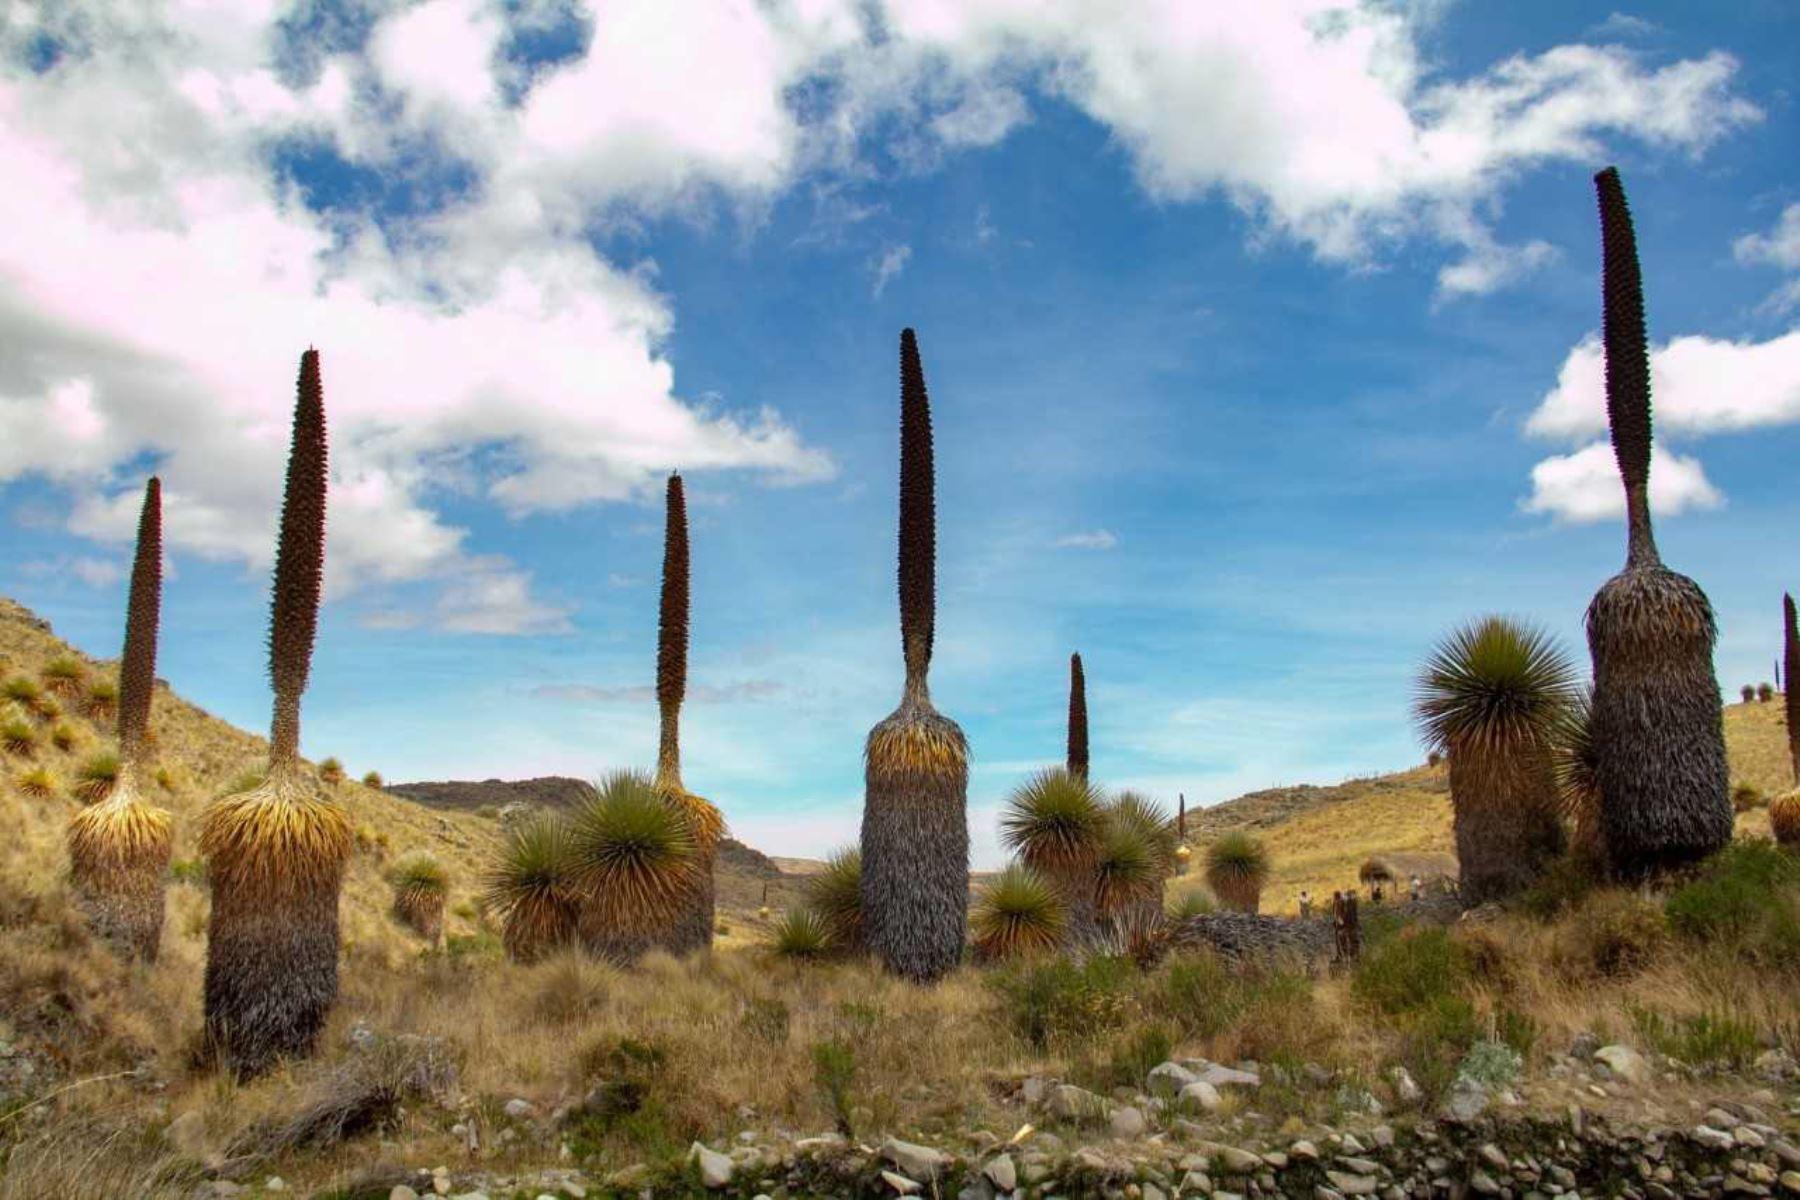 Santuario Nacional de Calipuy festeja efeméride como ejemplo de conservación. ANDINA/Difusión